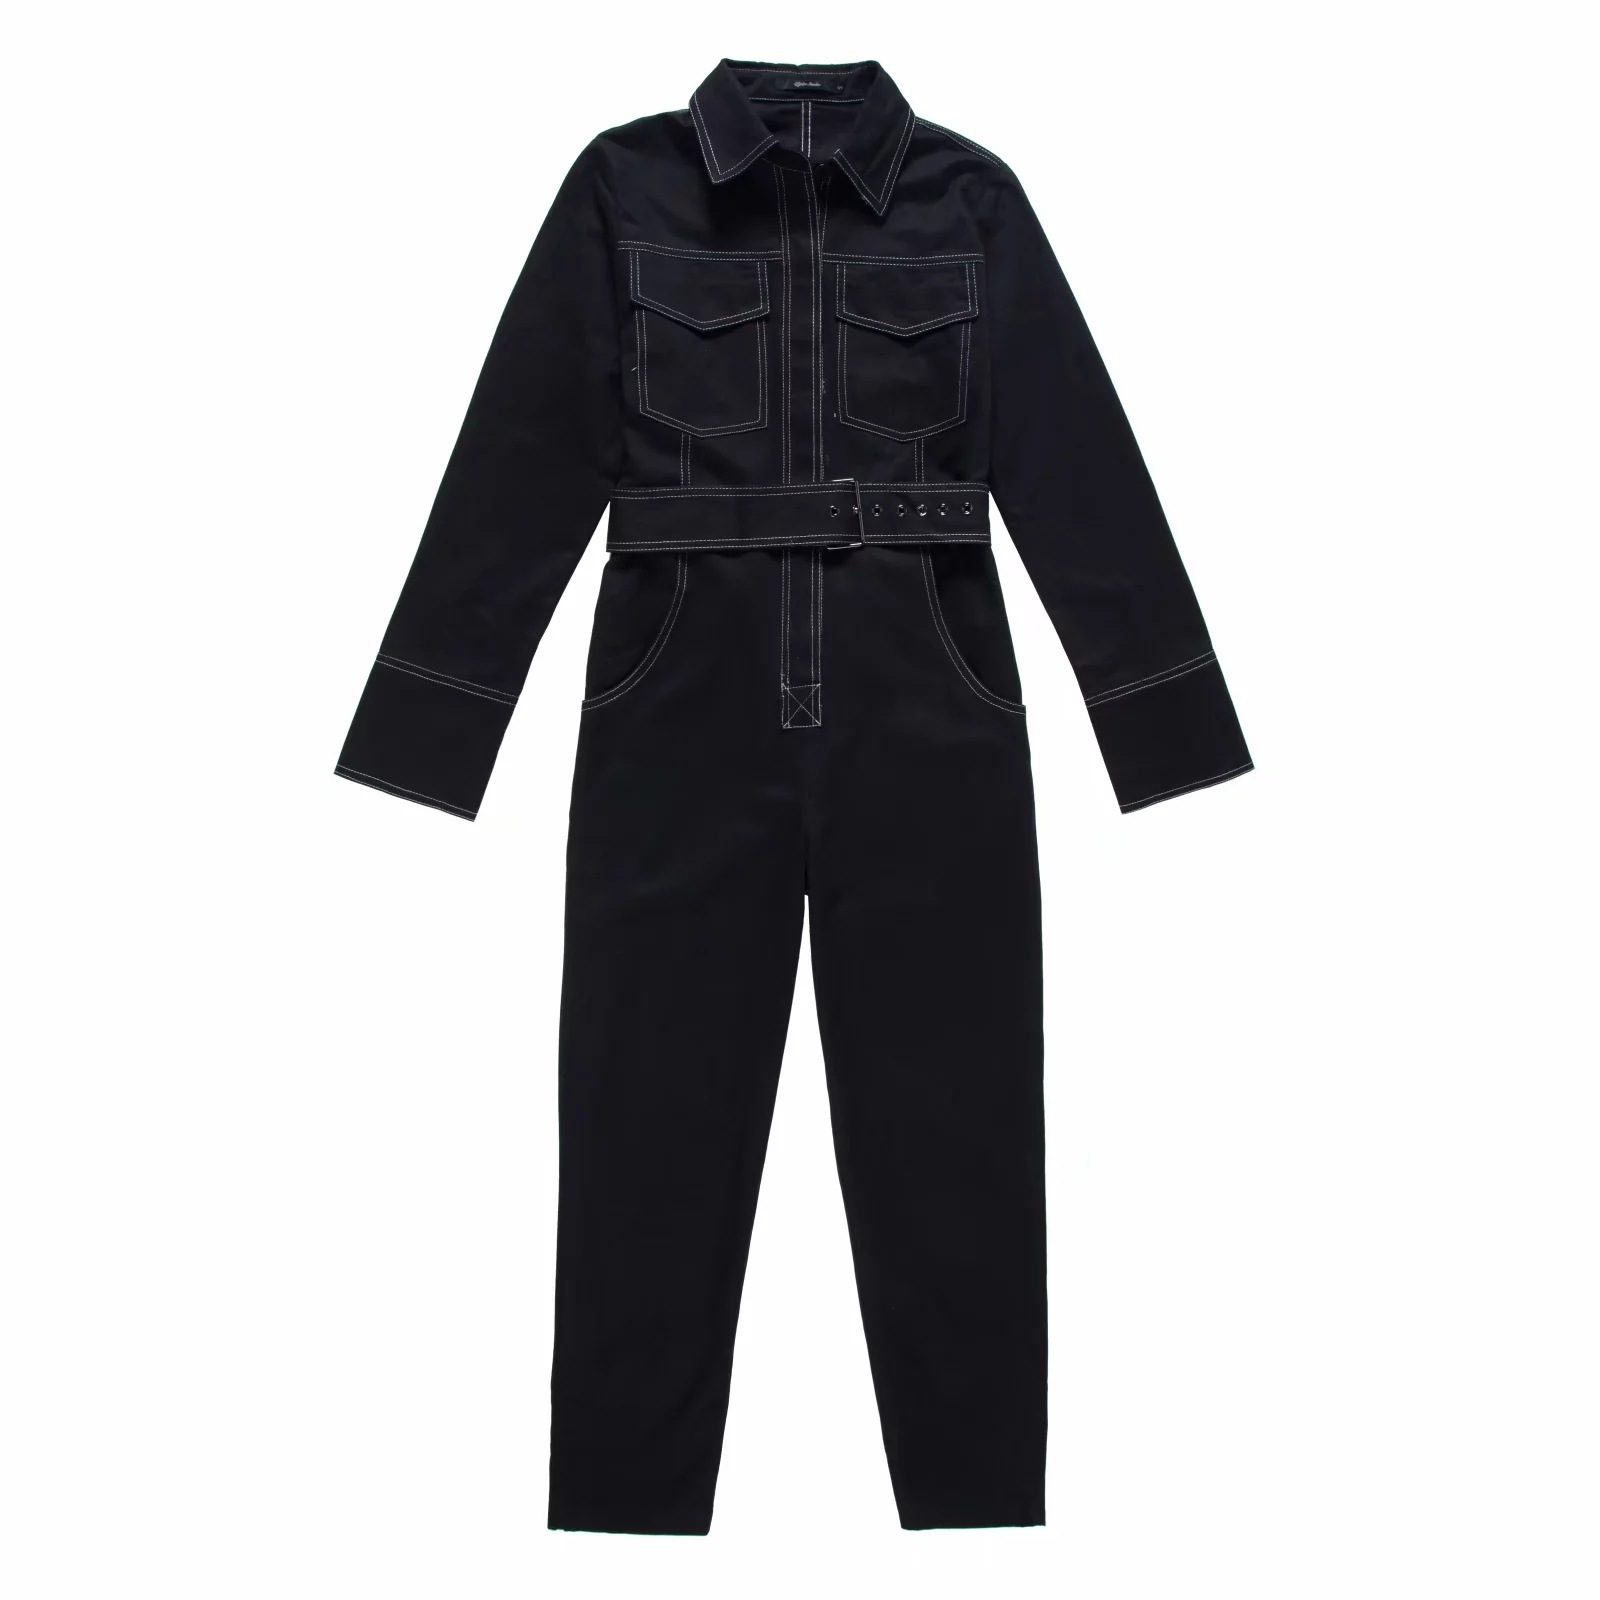 High Waist   Pants   Camouflage Loose Joggers Army Harem Camo   Pants   Women Streetwear Punk Black Cargo   Pants     Capris   Trousers XM479